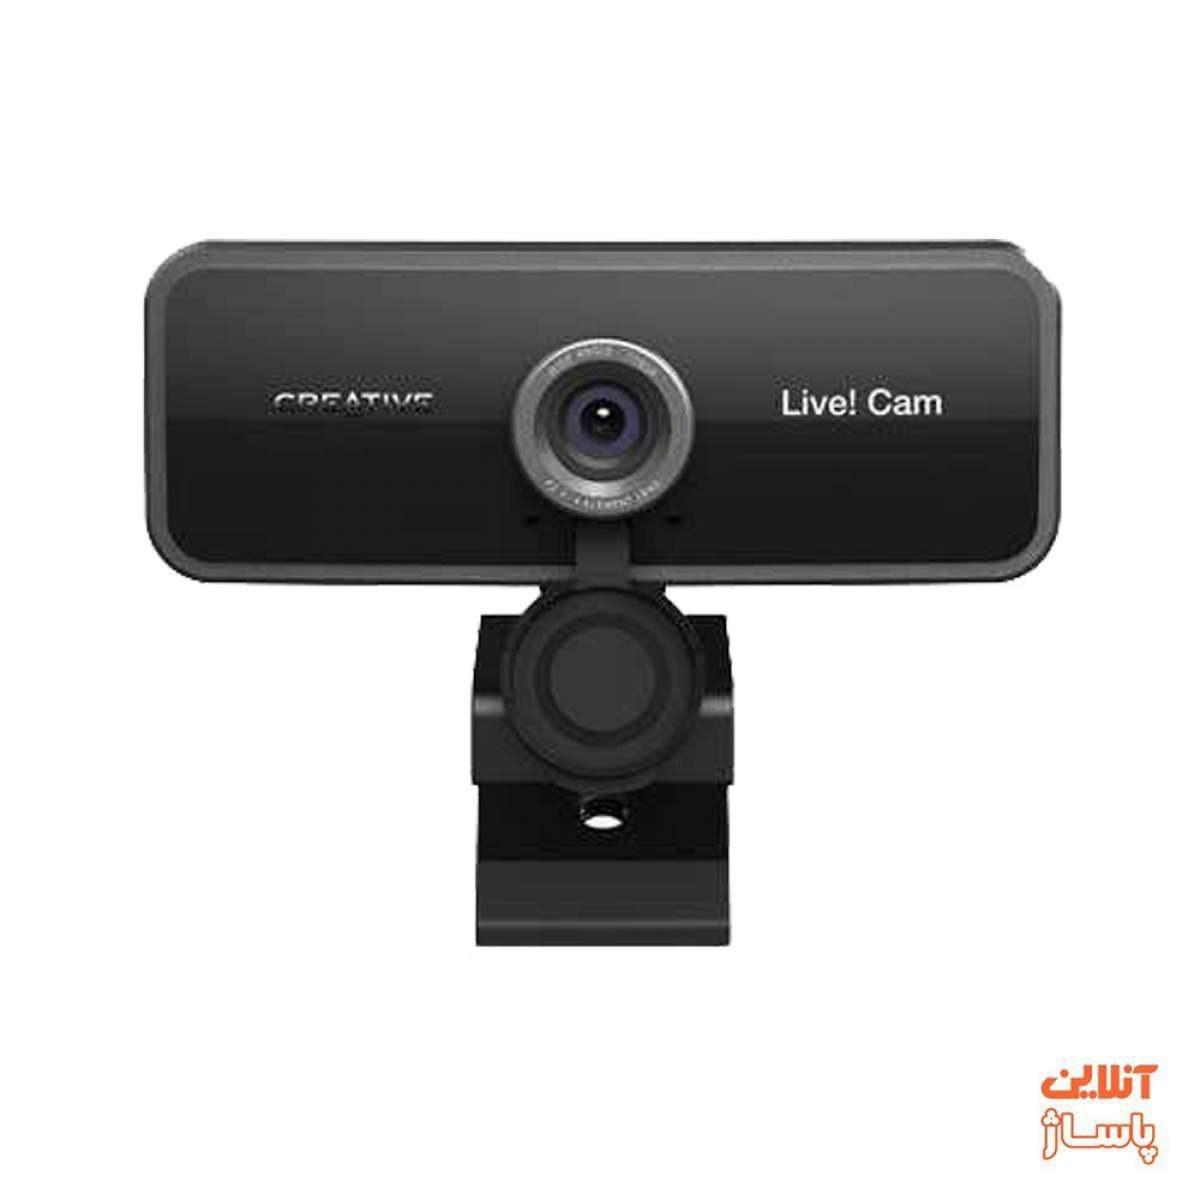 تصویر وب کم کریتیو مدل Live Cam SYNC Creative Live Cam SYNC Webcam